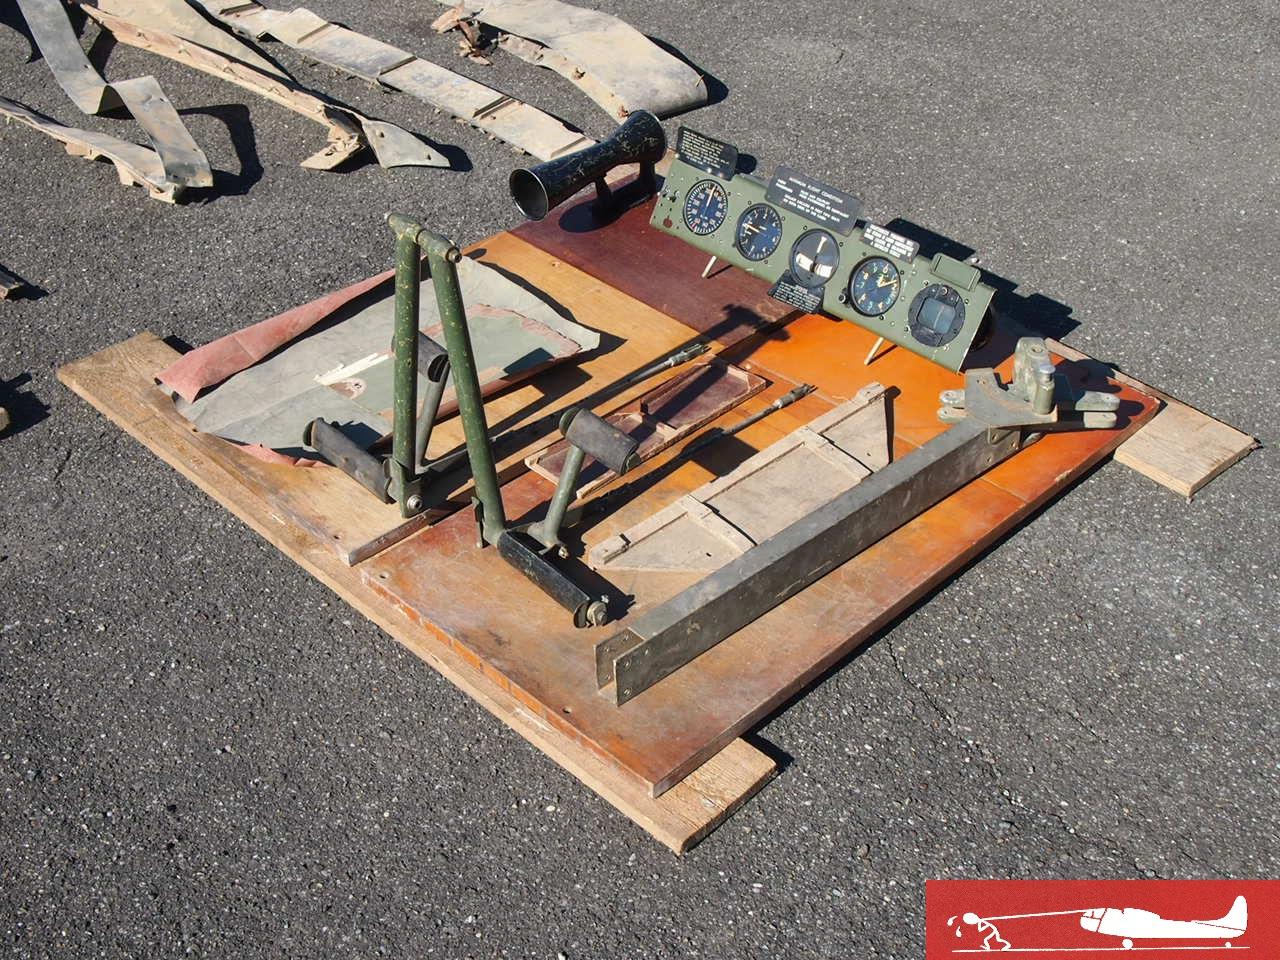 [Gliderborne] Restauration planeur WACO CG-4A P4179737